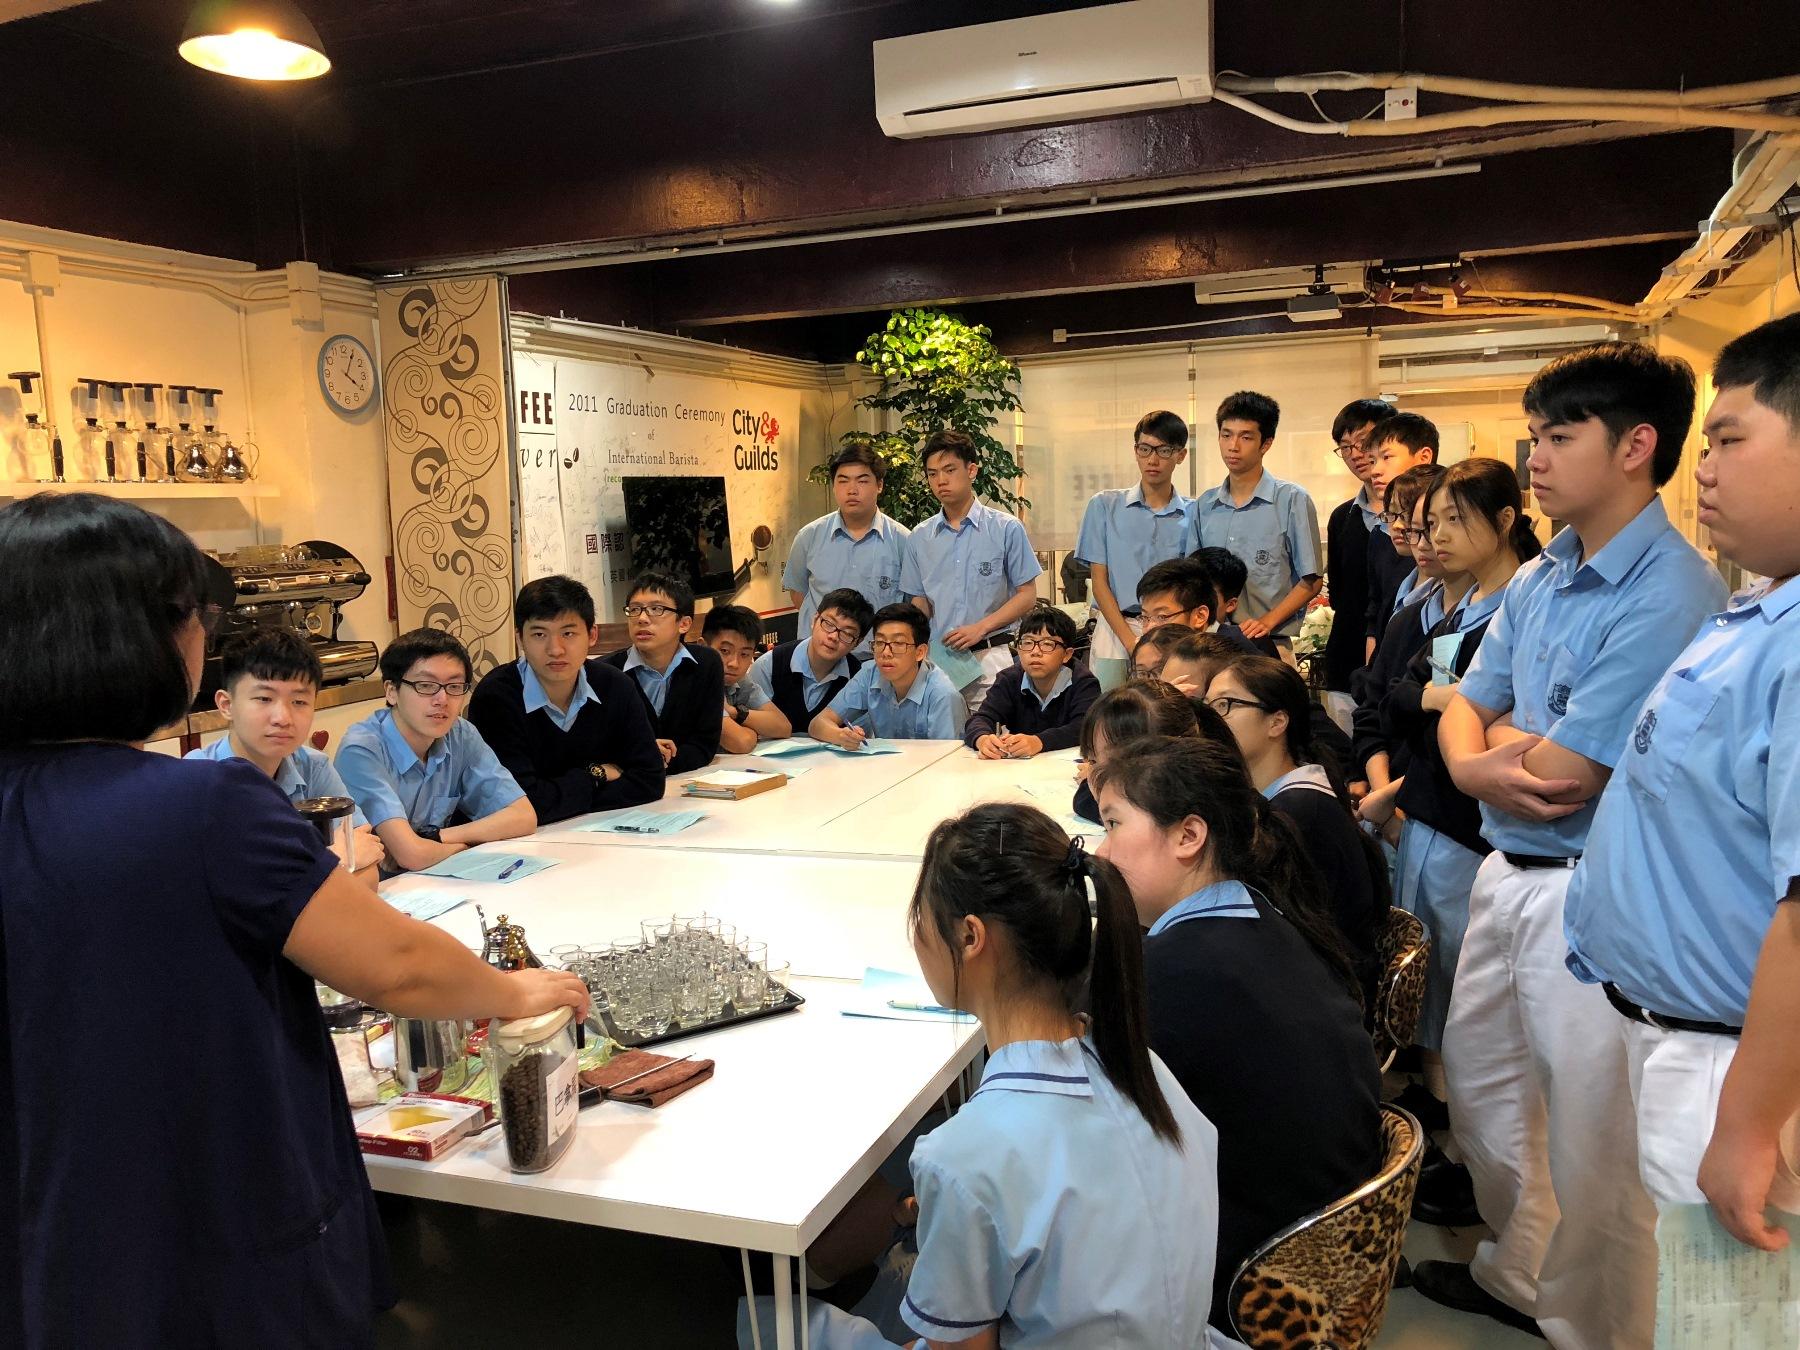 http://www.npc.edu.hk/sites/default/files/img_1197_1.jpg